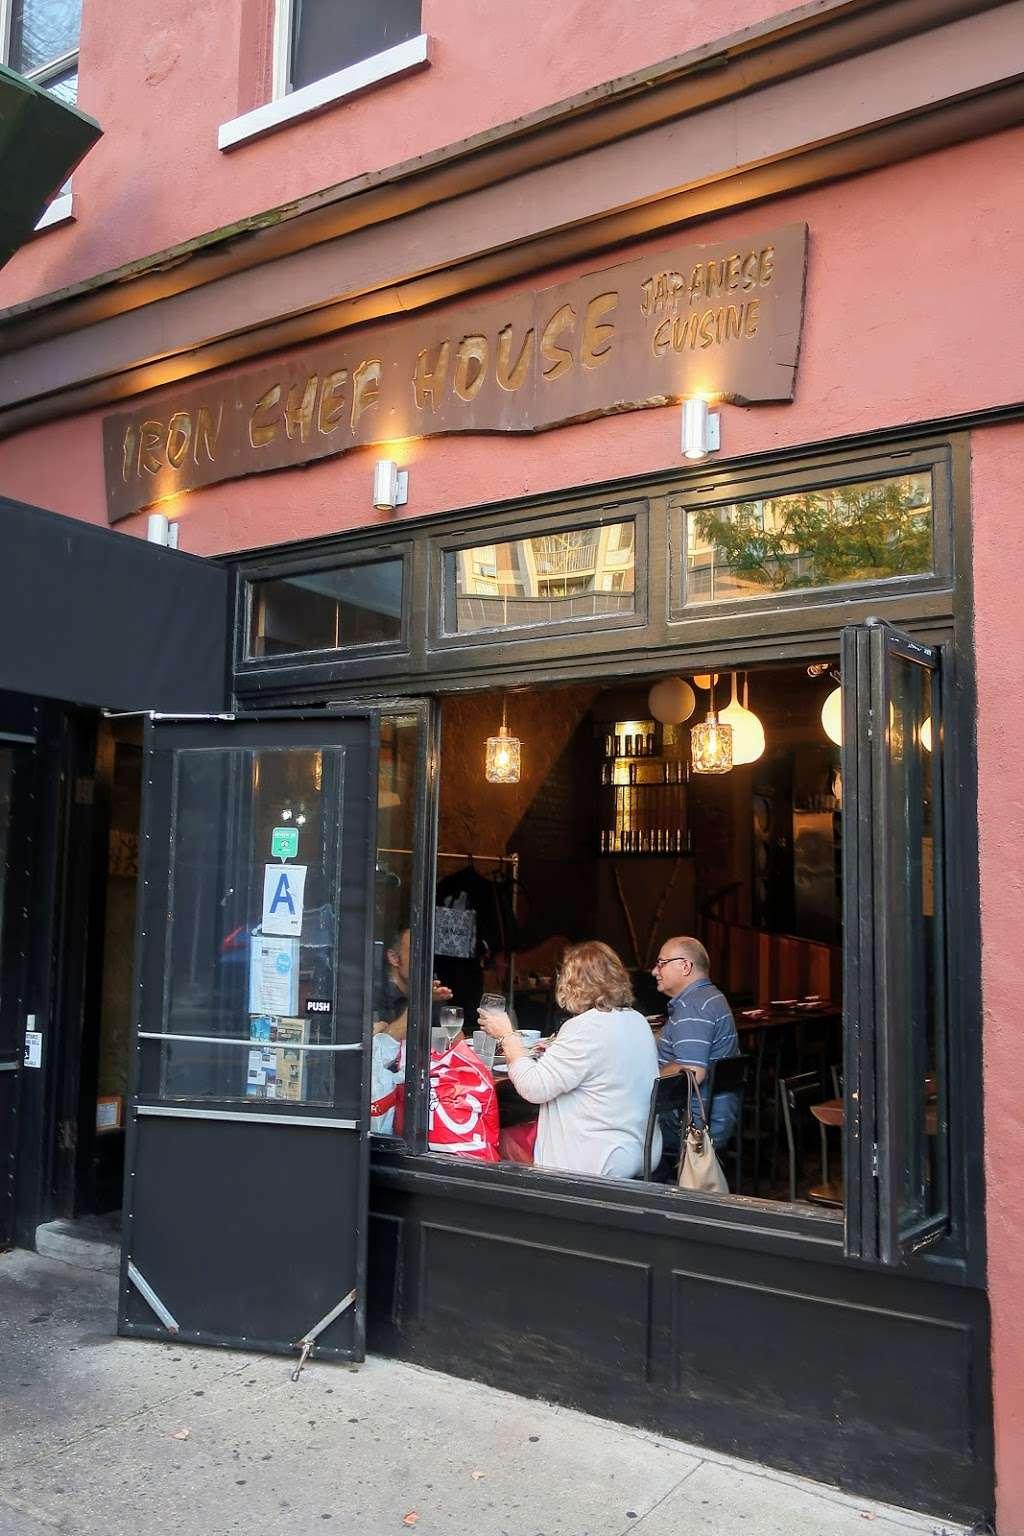 Iron Chef House - restaurant    Photo 3 of 10   Address: 92 Clark St, Brooklyn, NY 11201, USA   Phone: (718) 858-8517